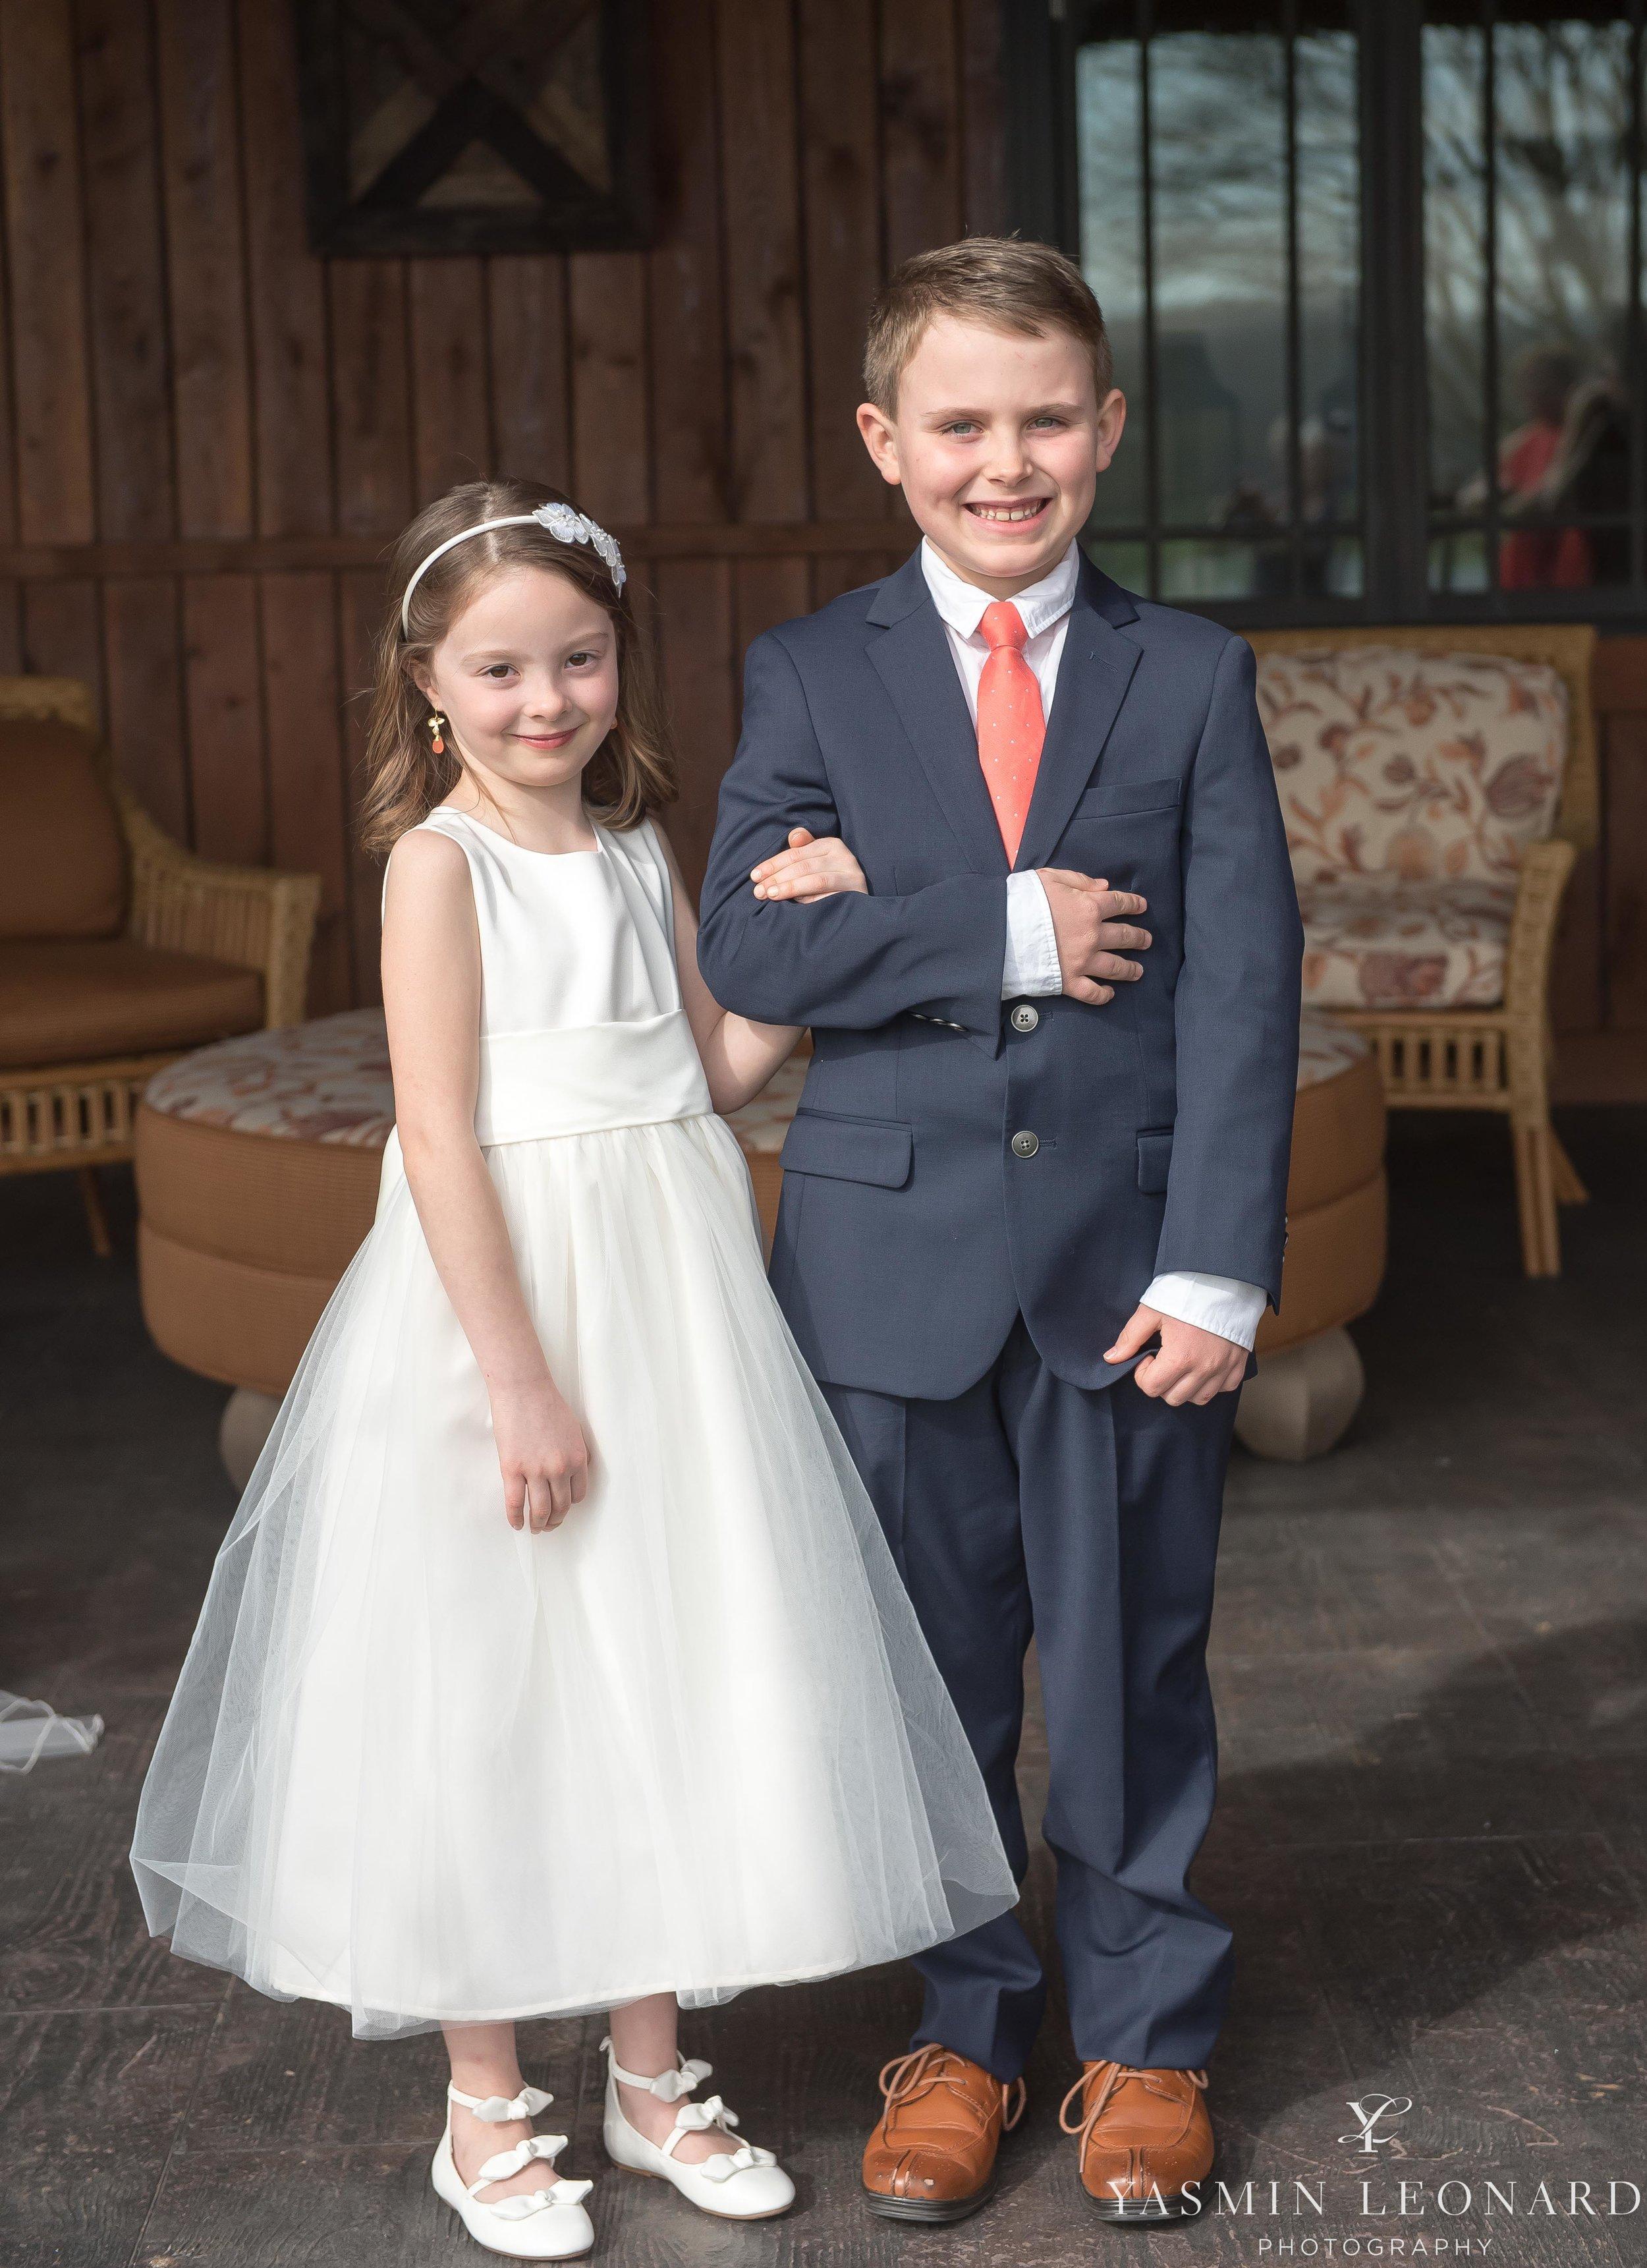 Adaumont Farm - Adaumont Farm Weddings - Trinity Weddings - NC Weddings - Yasmin Leonard Photography-21.jpg